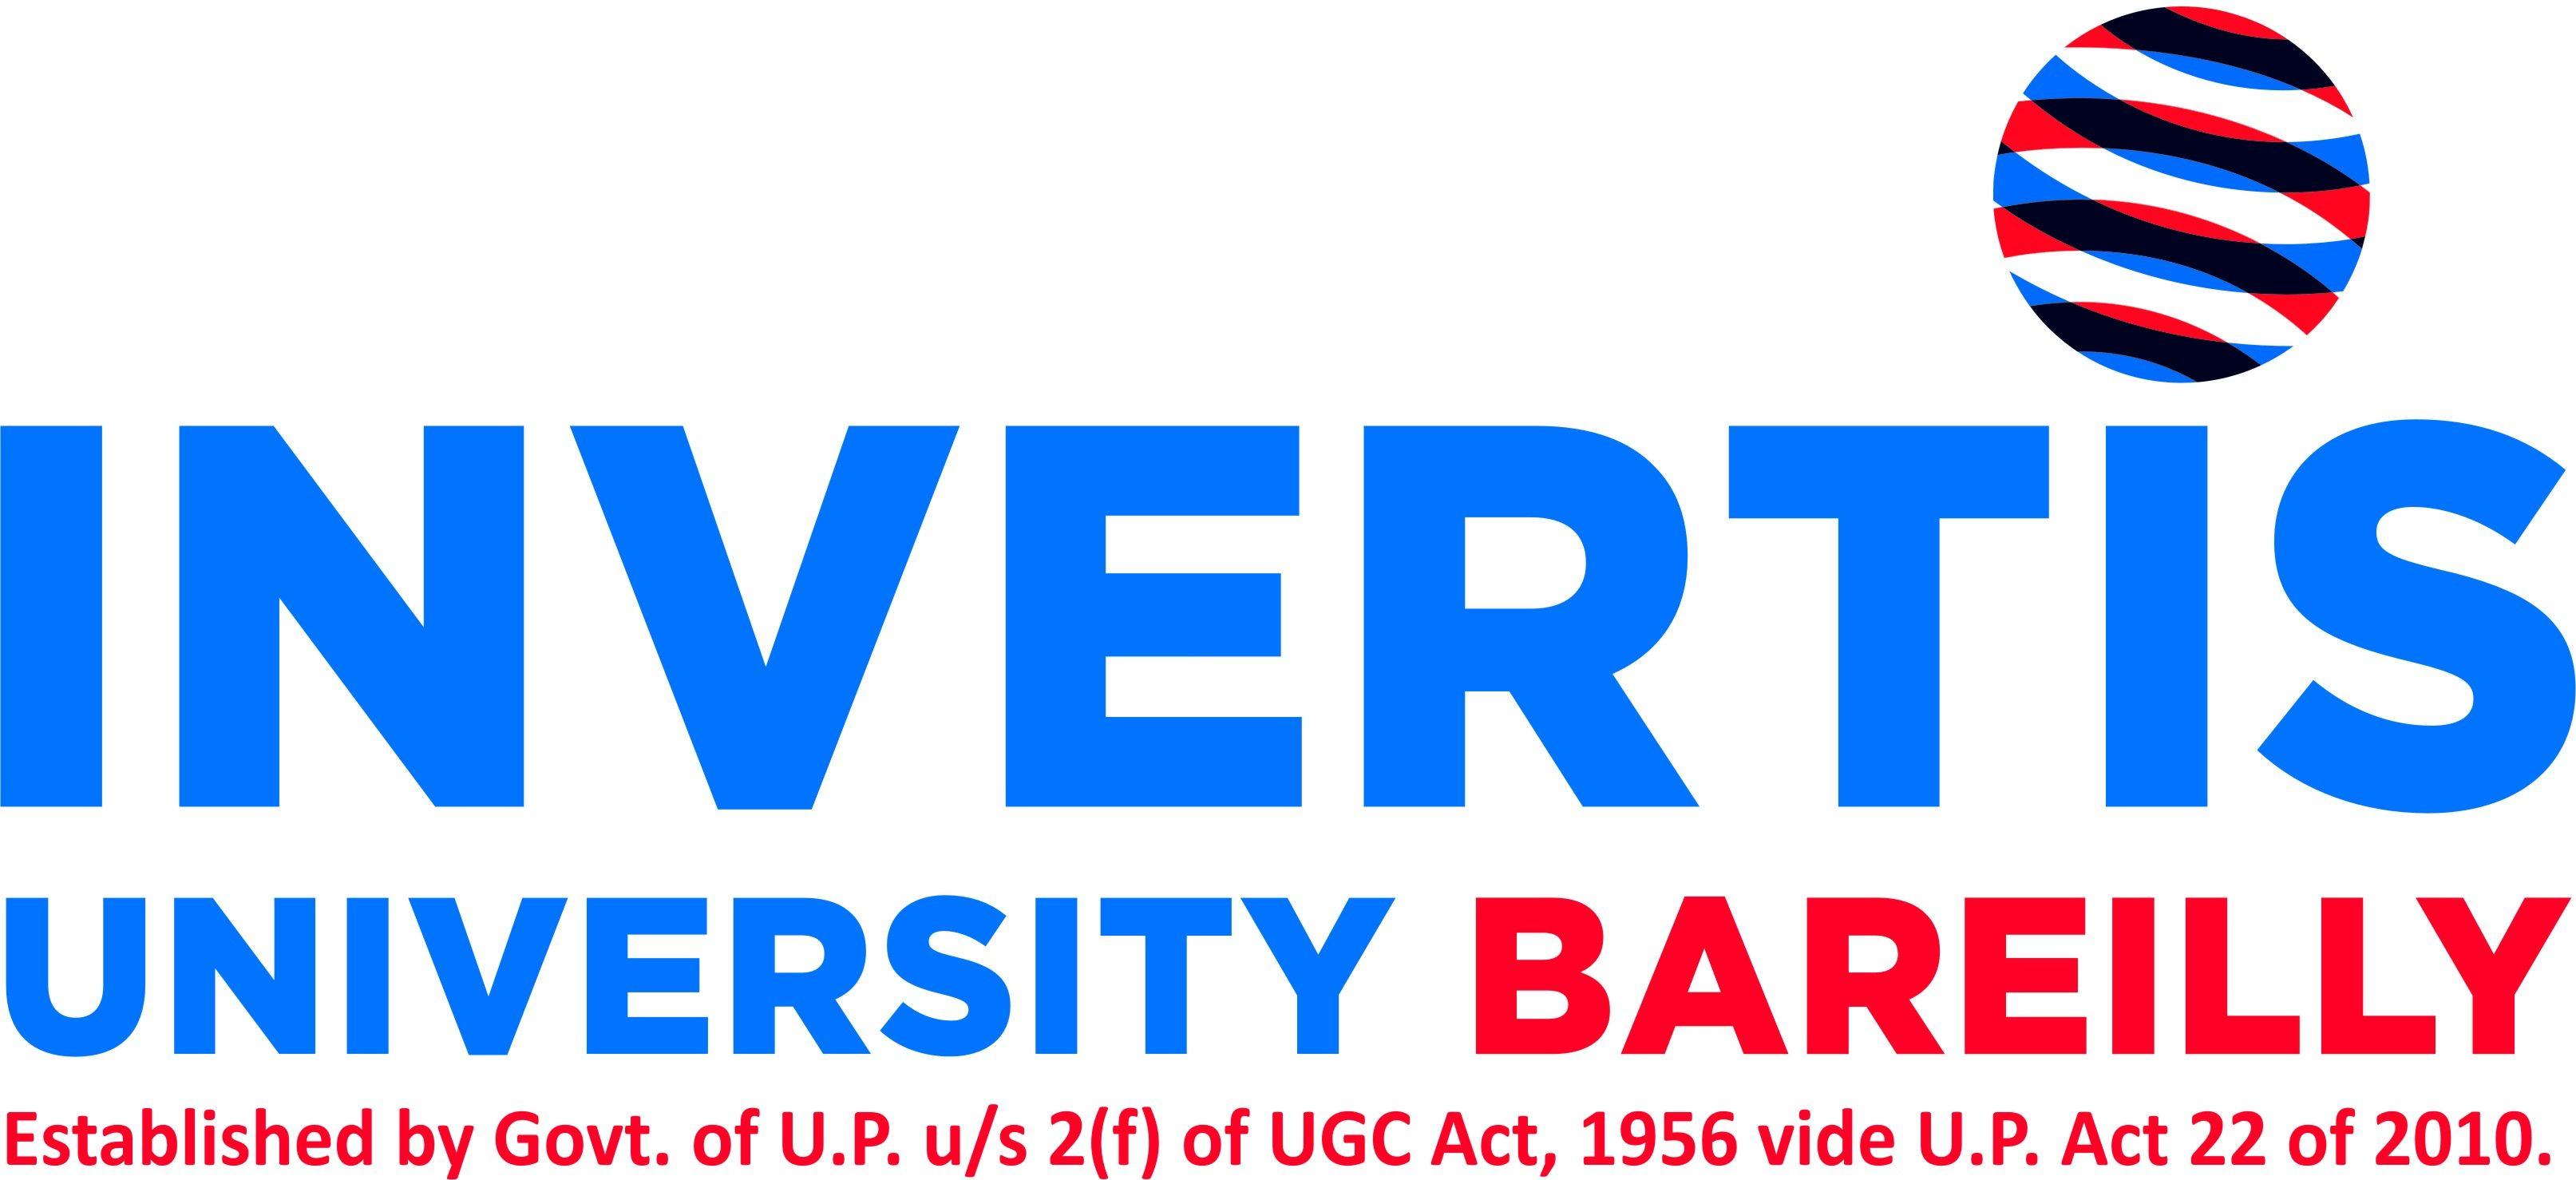 Courses Bca B Com B Tech M Tech Invertis University Admission University Admissions University Admissions